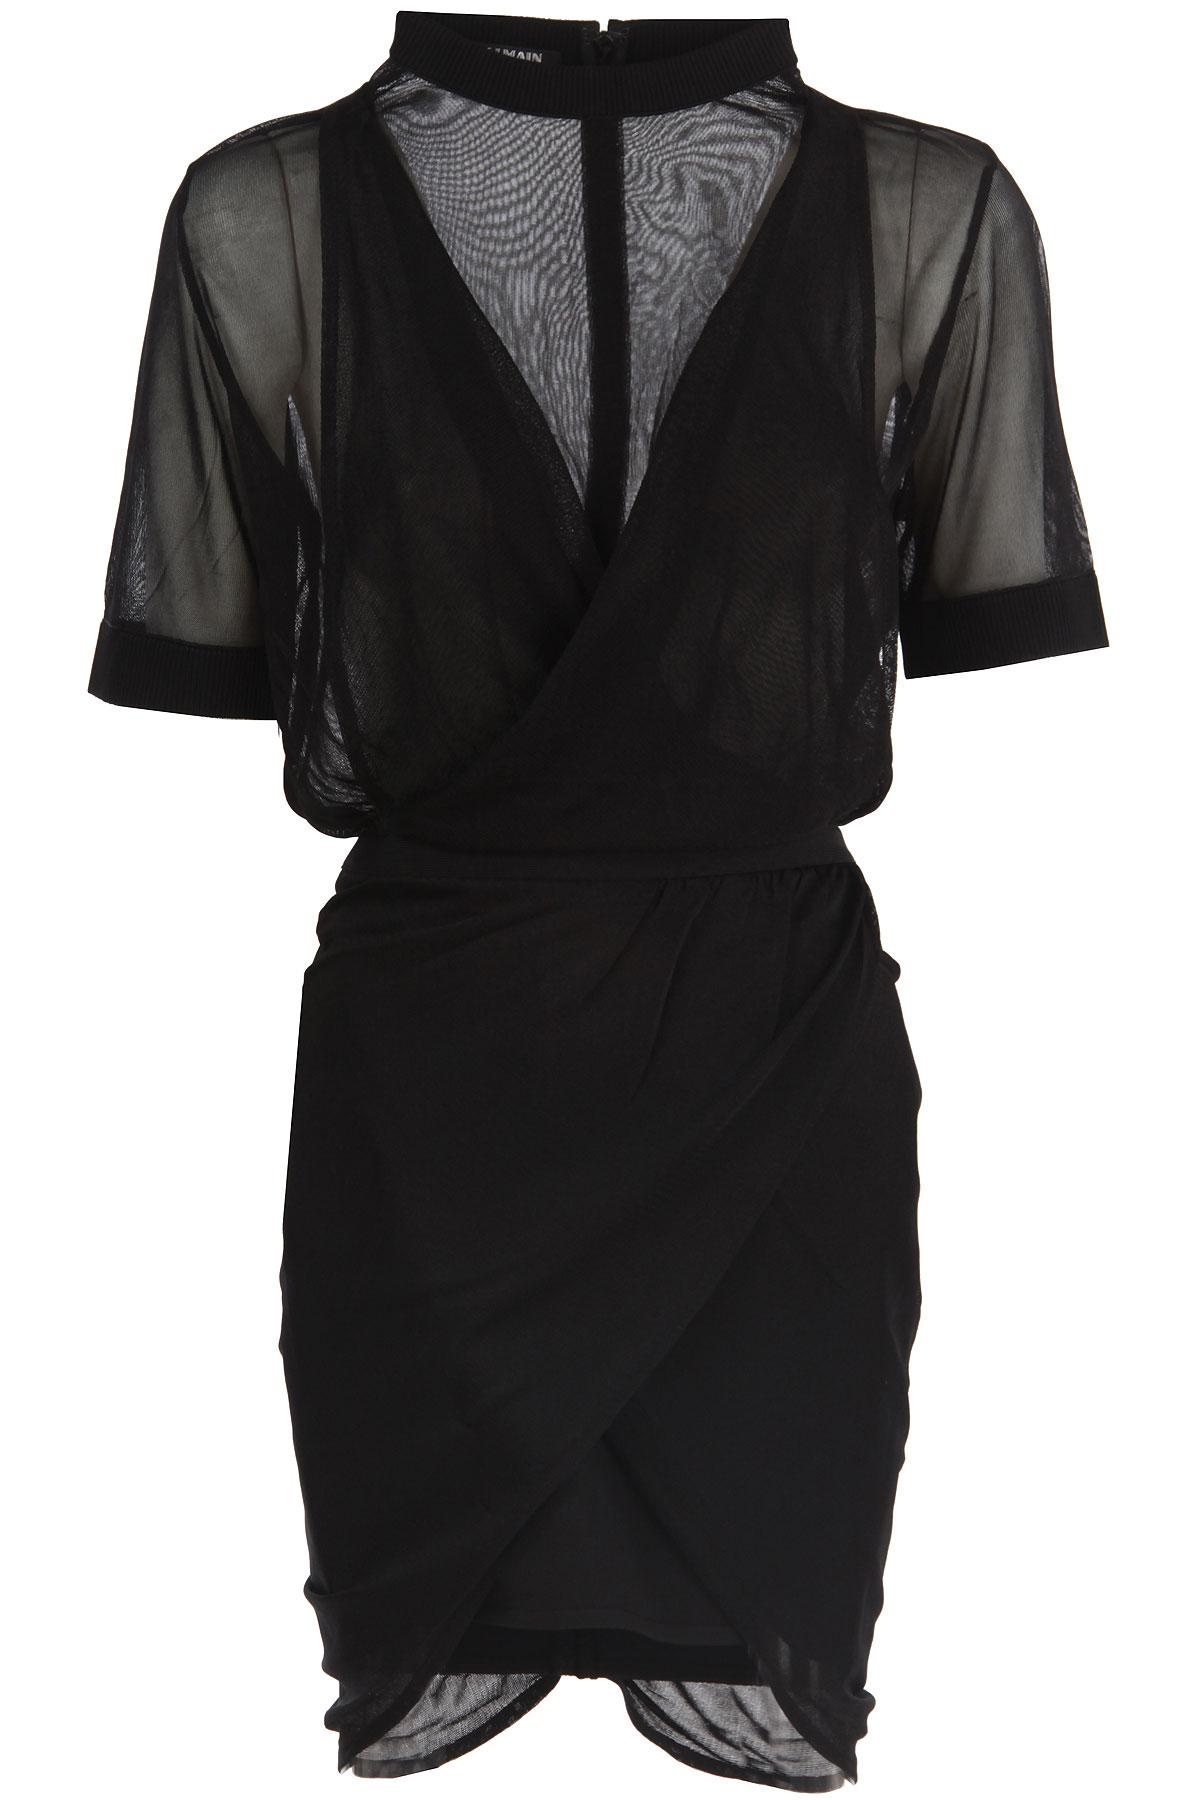 Balmain Robe Femme Pas cher en Soldes, Noir, Viscose, 2017, 38 40 XXS